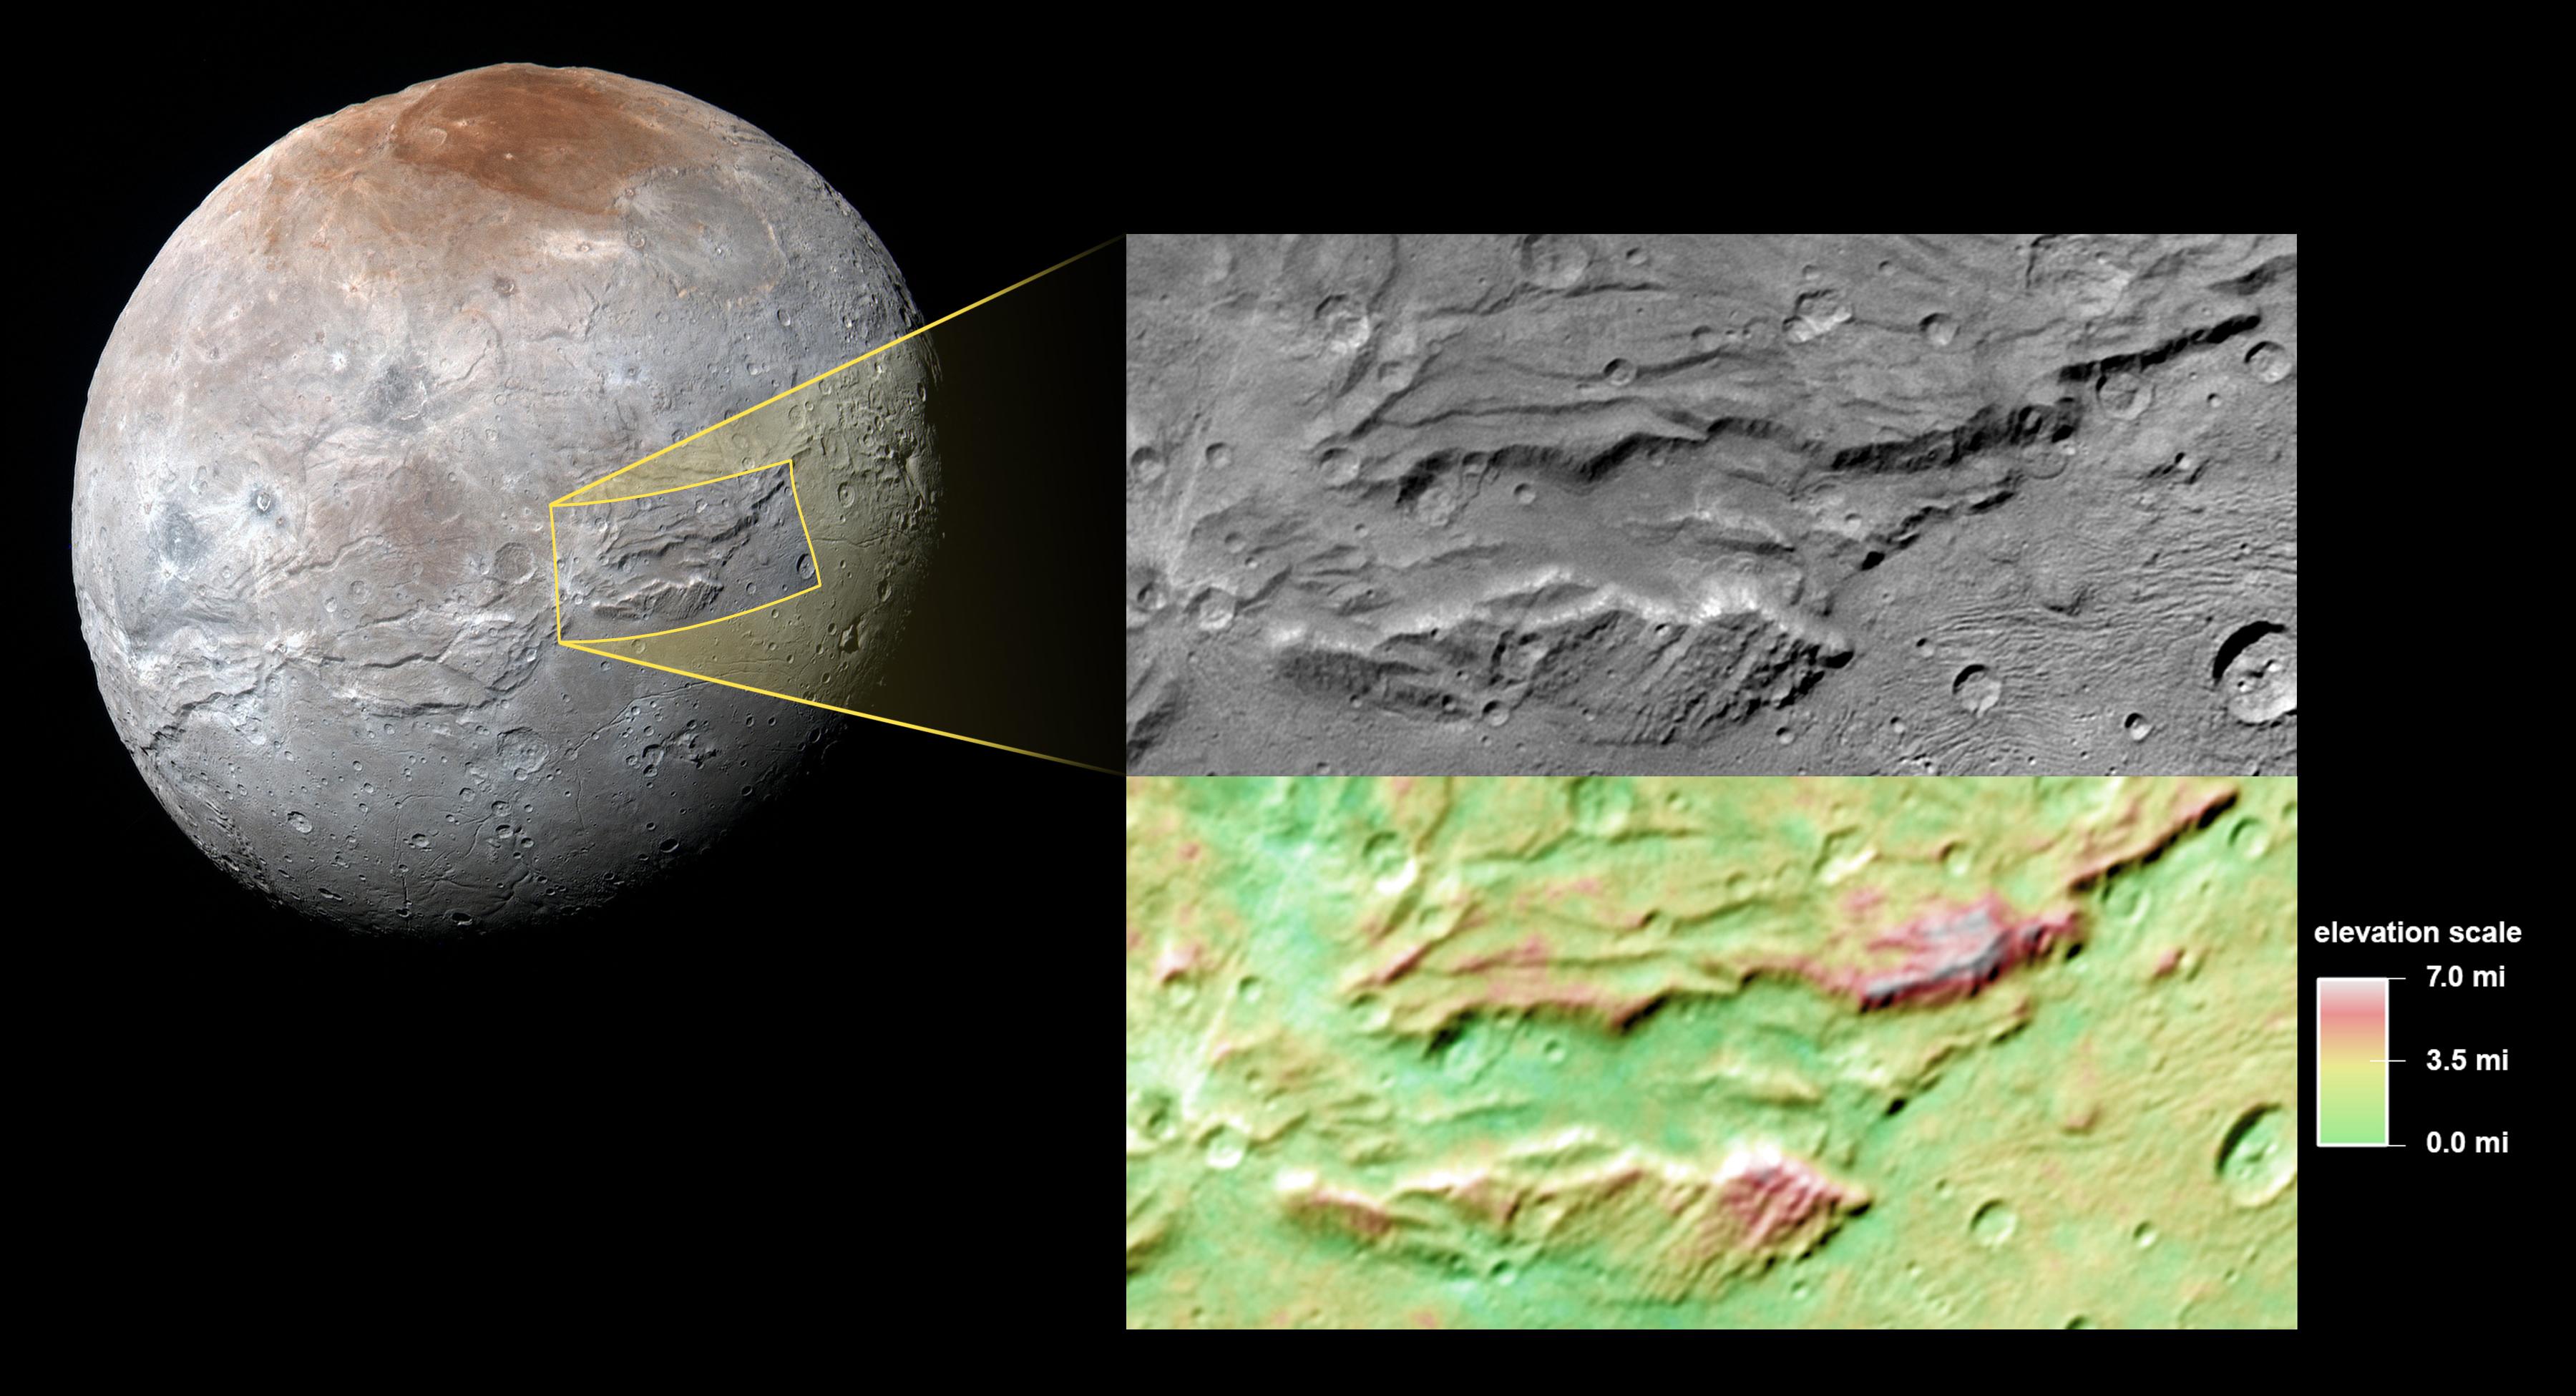 Charon Moon: Pluto's 'Hulk-like' Moon Charon: A Possible Ancient Ocean